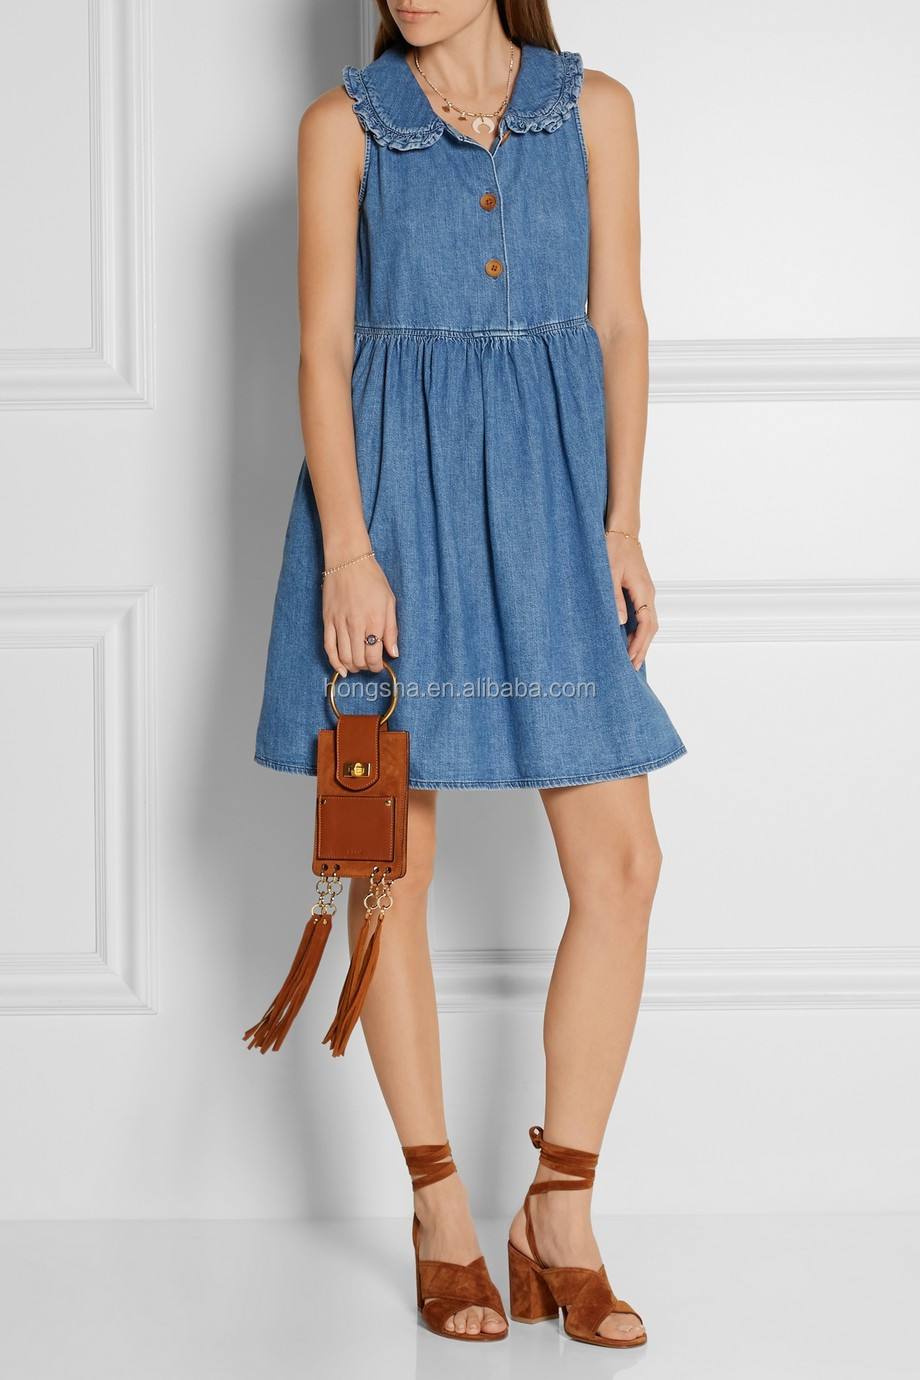 New Model Casual Ruffle-trimmed Chambray Denim Fabric Mini Dress ...